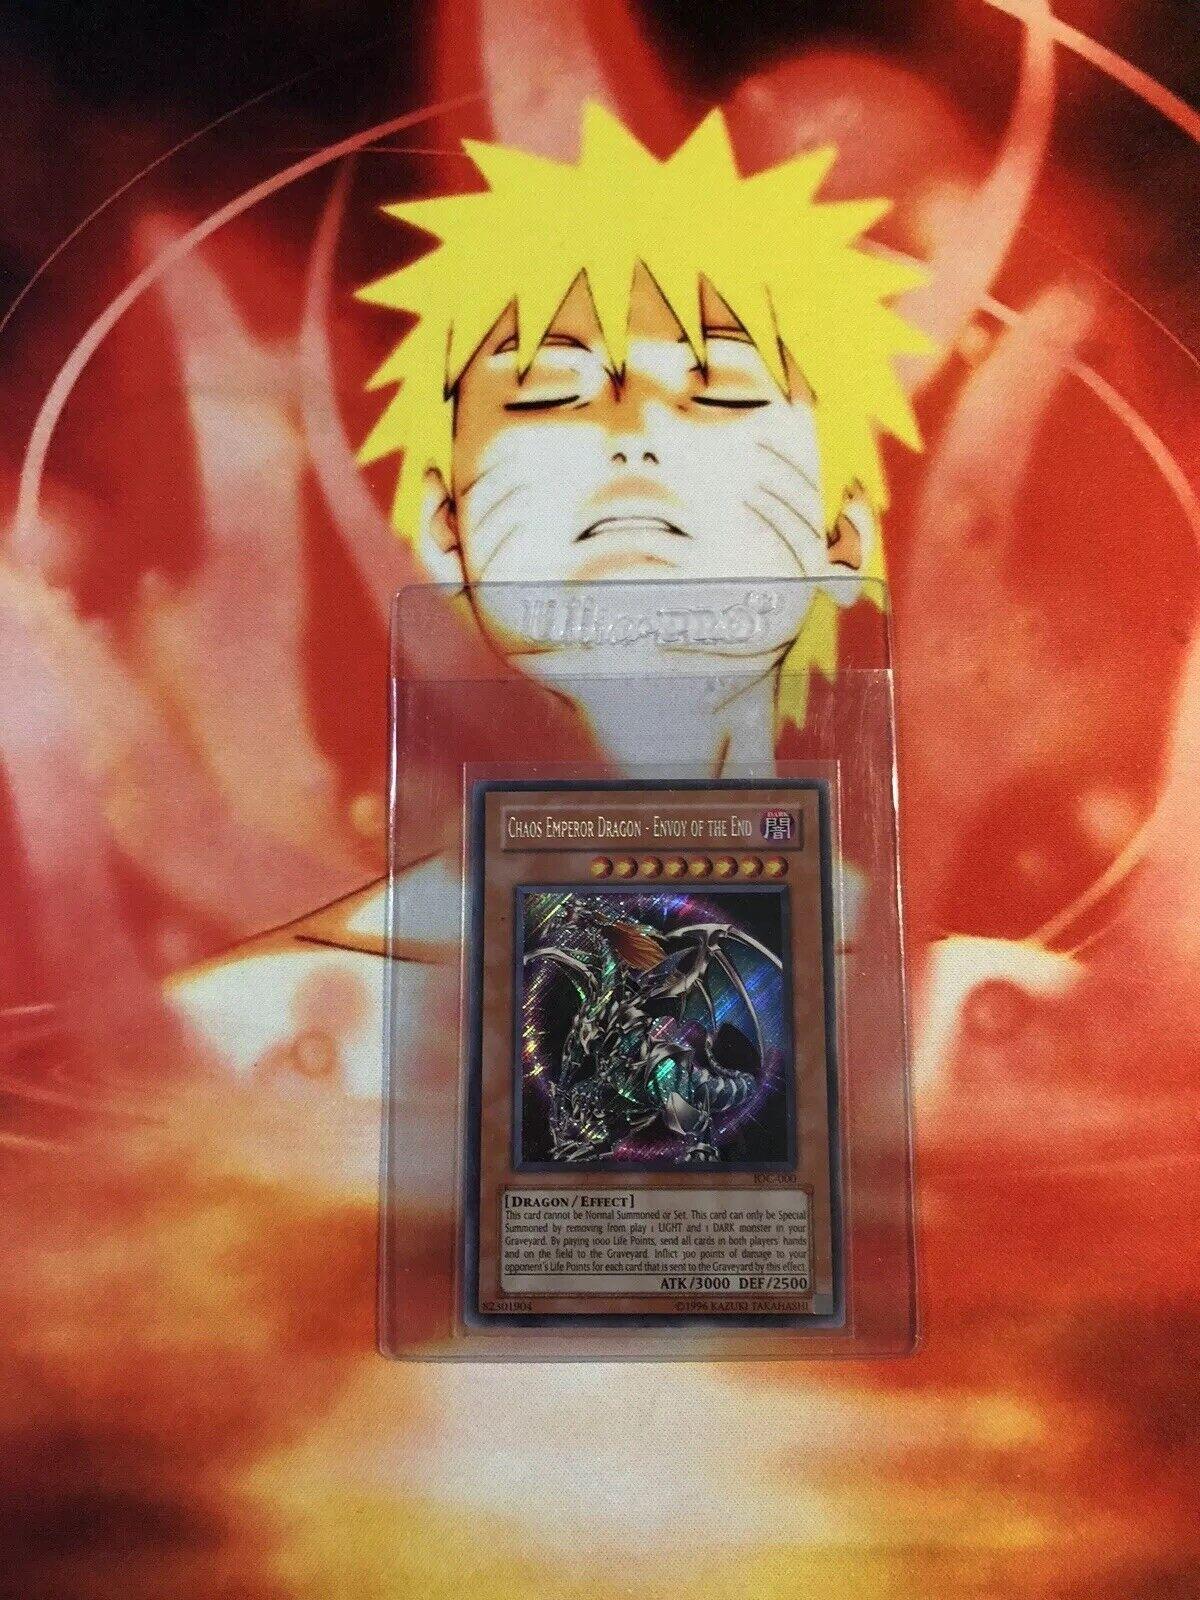 Chaos emperor dragon envoy end secret